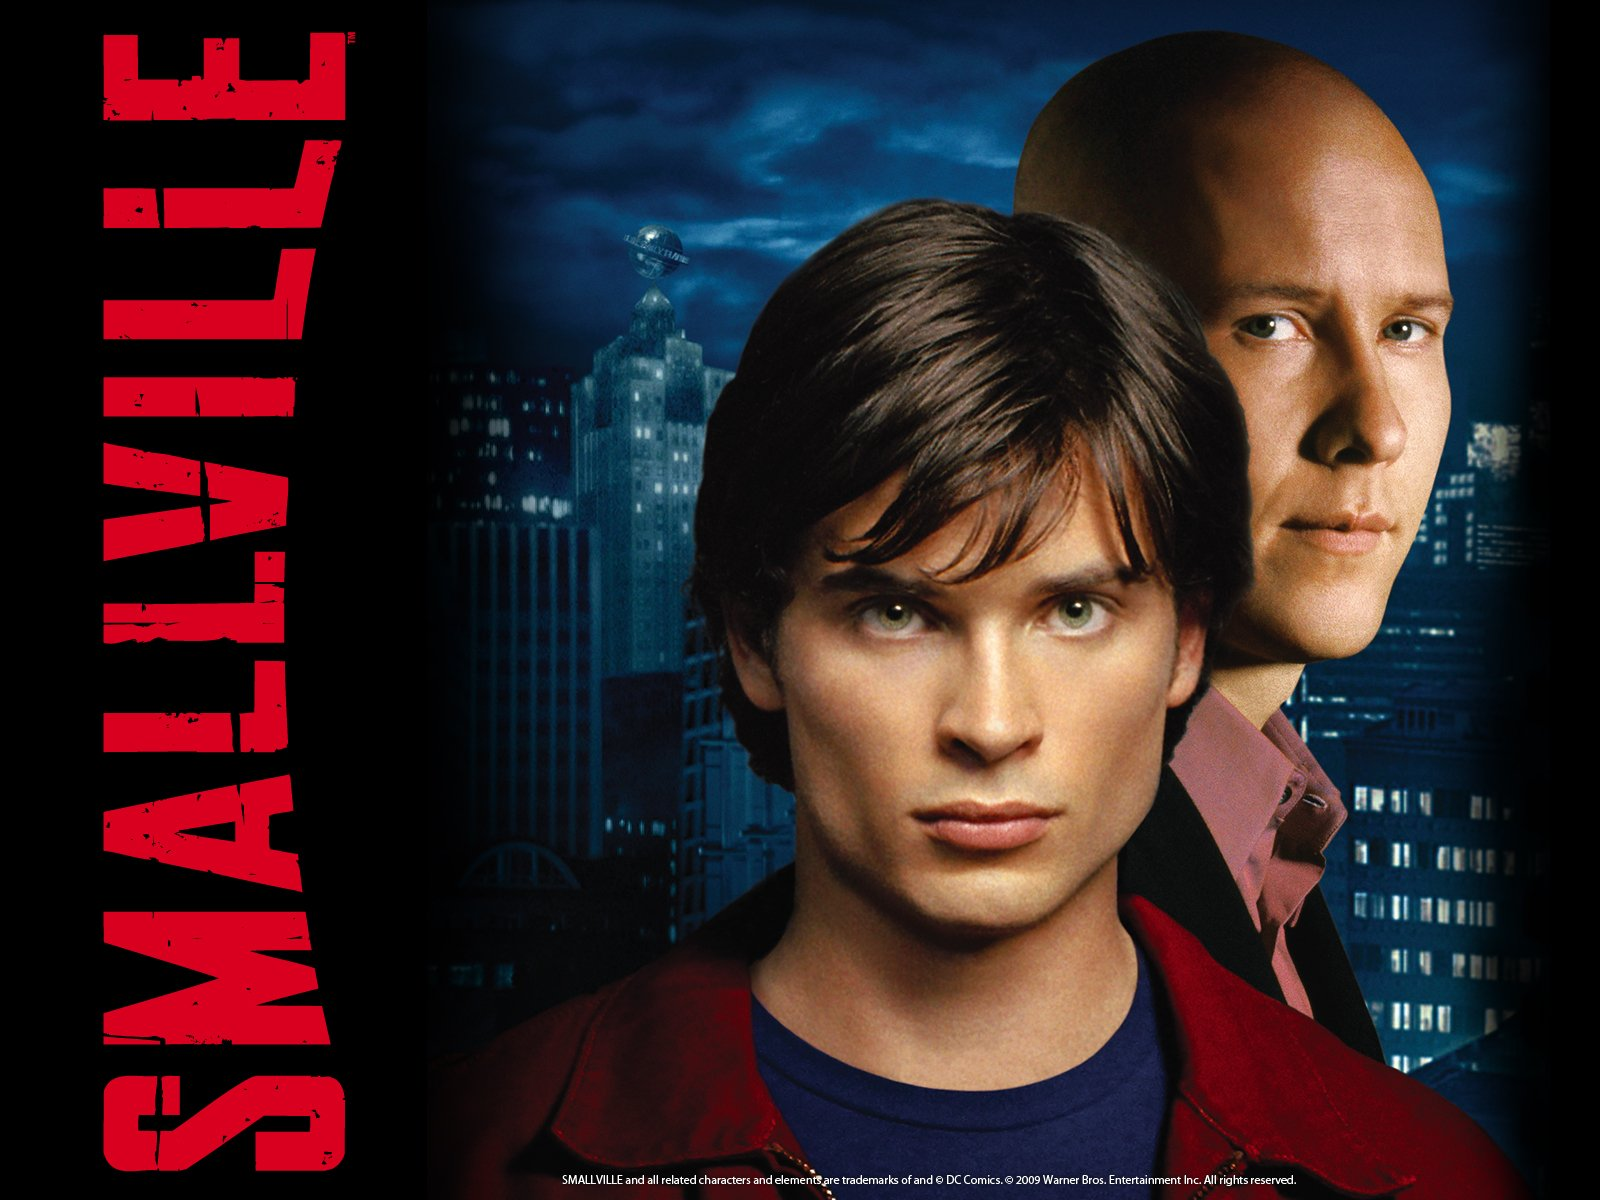 smallville season 9 episode 22 download